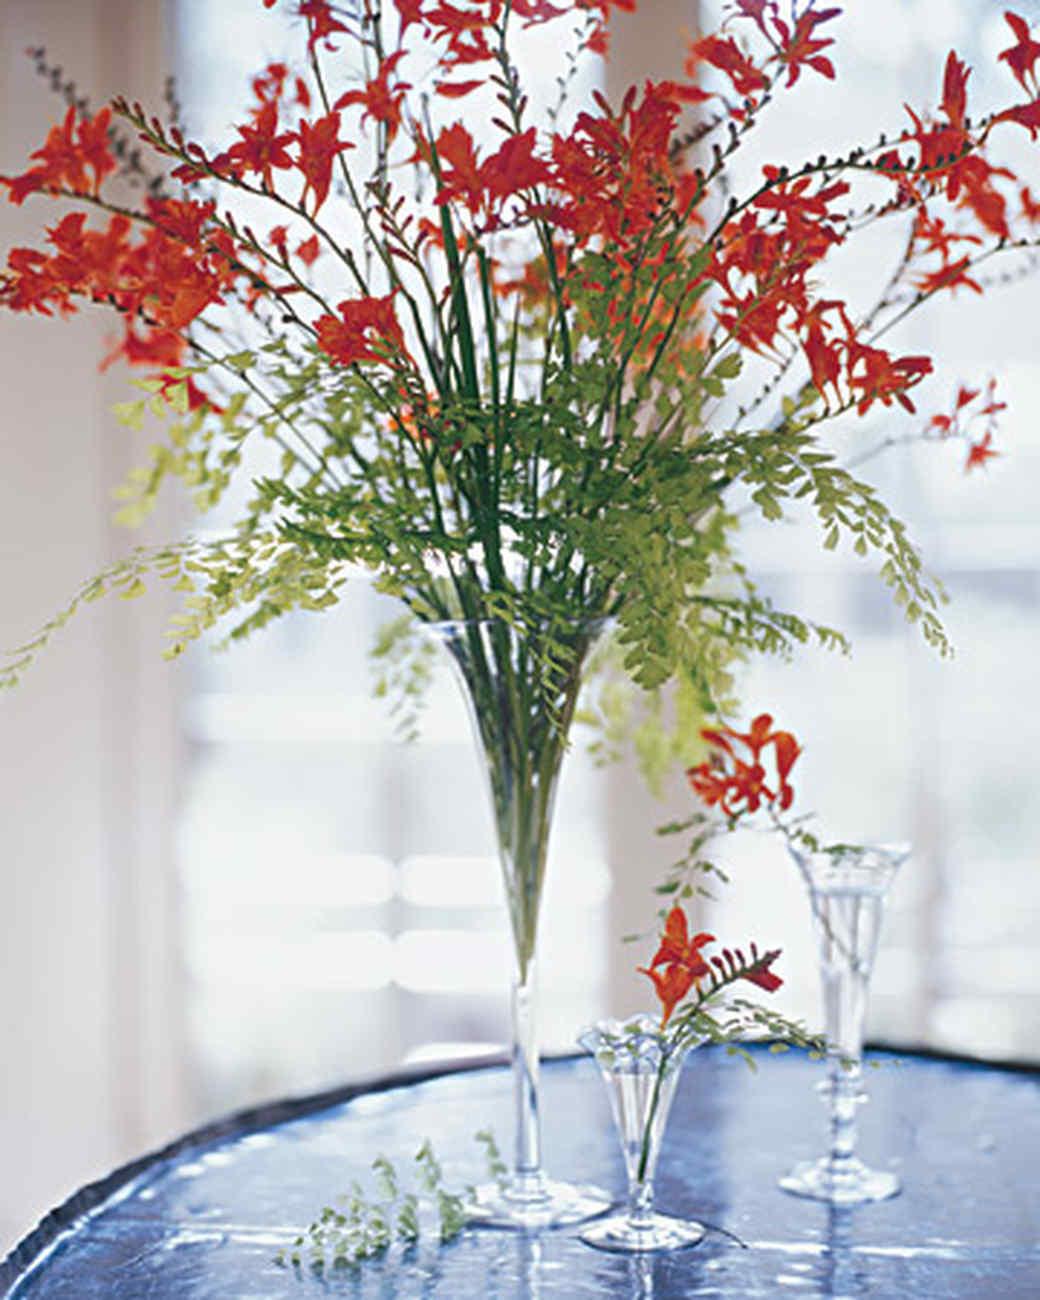 3 Feet Tall Vases Of Marthas Flower Arranging Secrets Martha Stewart within Lesson 3